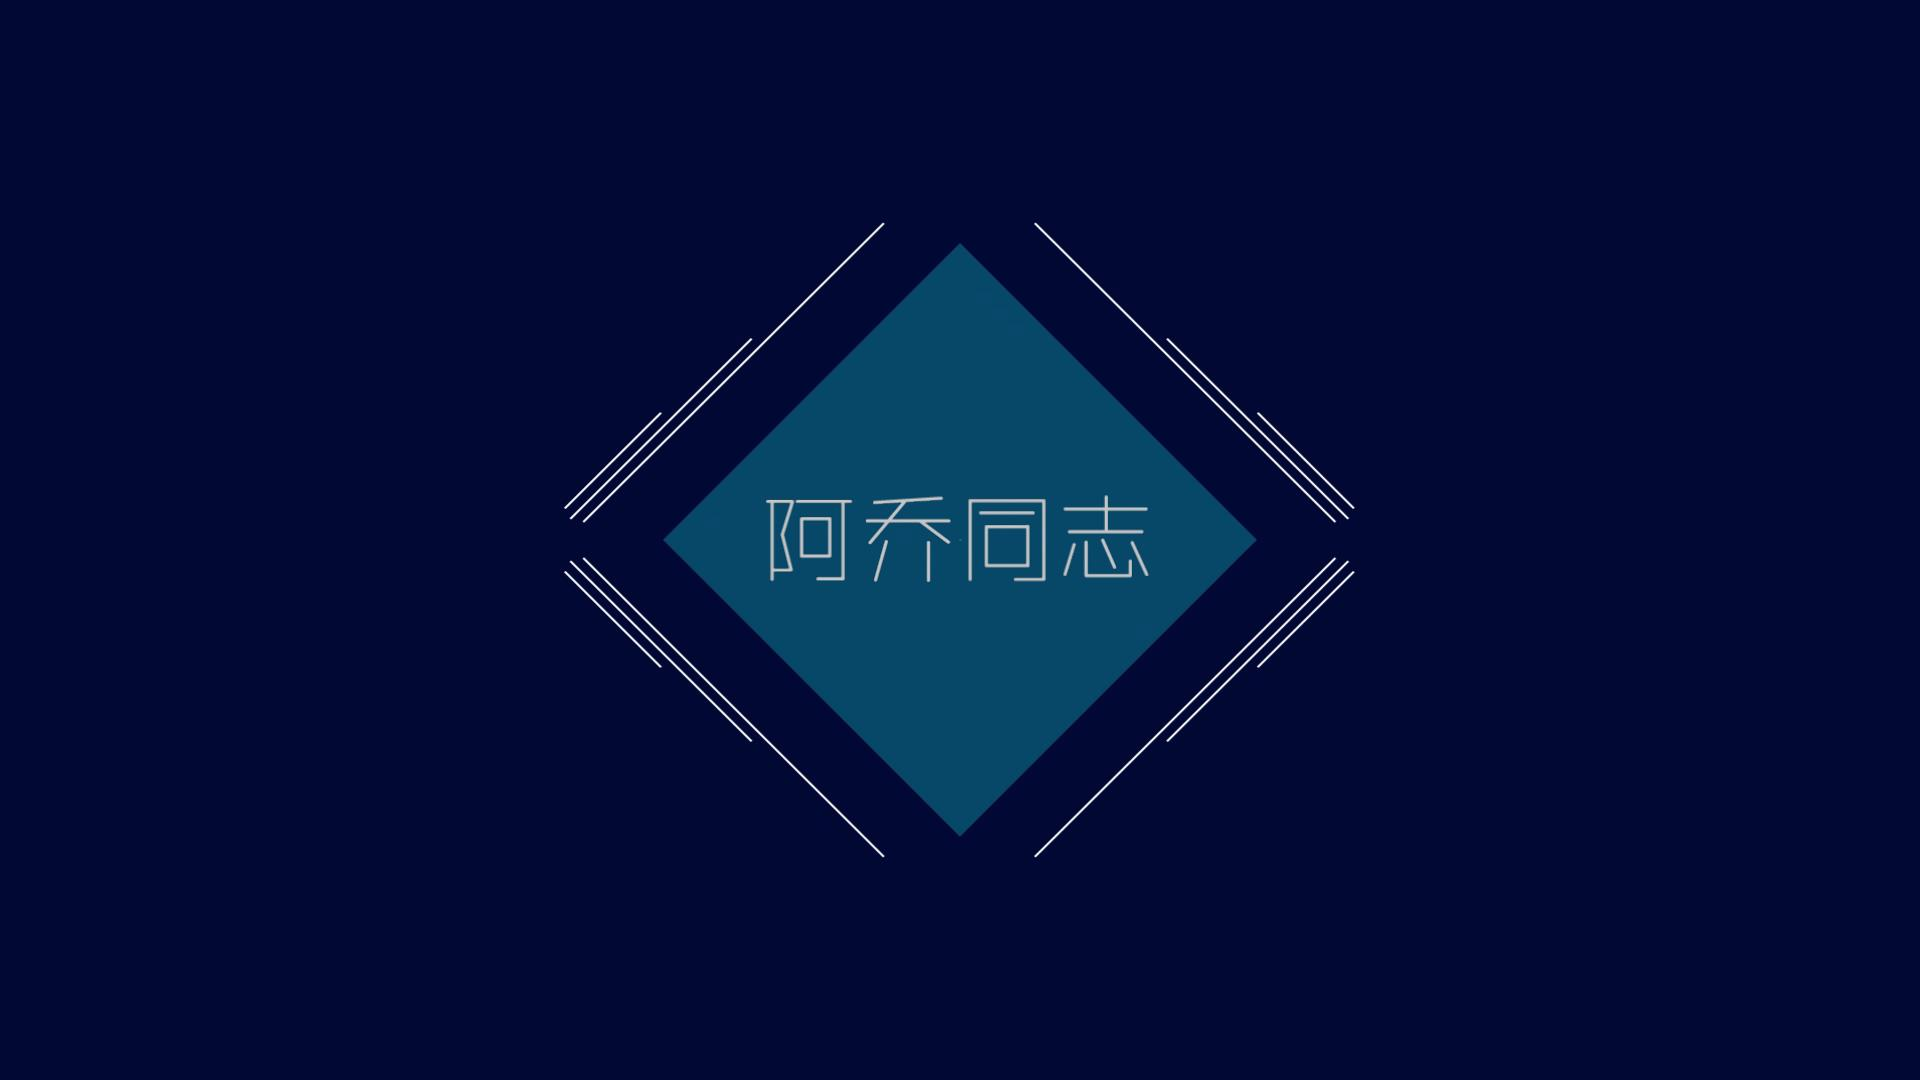 JOE\-25 卡通动画LOGO文字展示